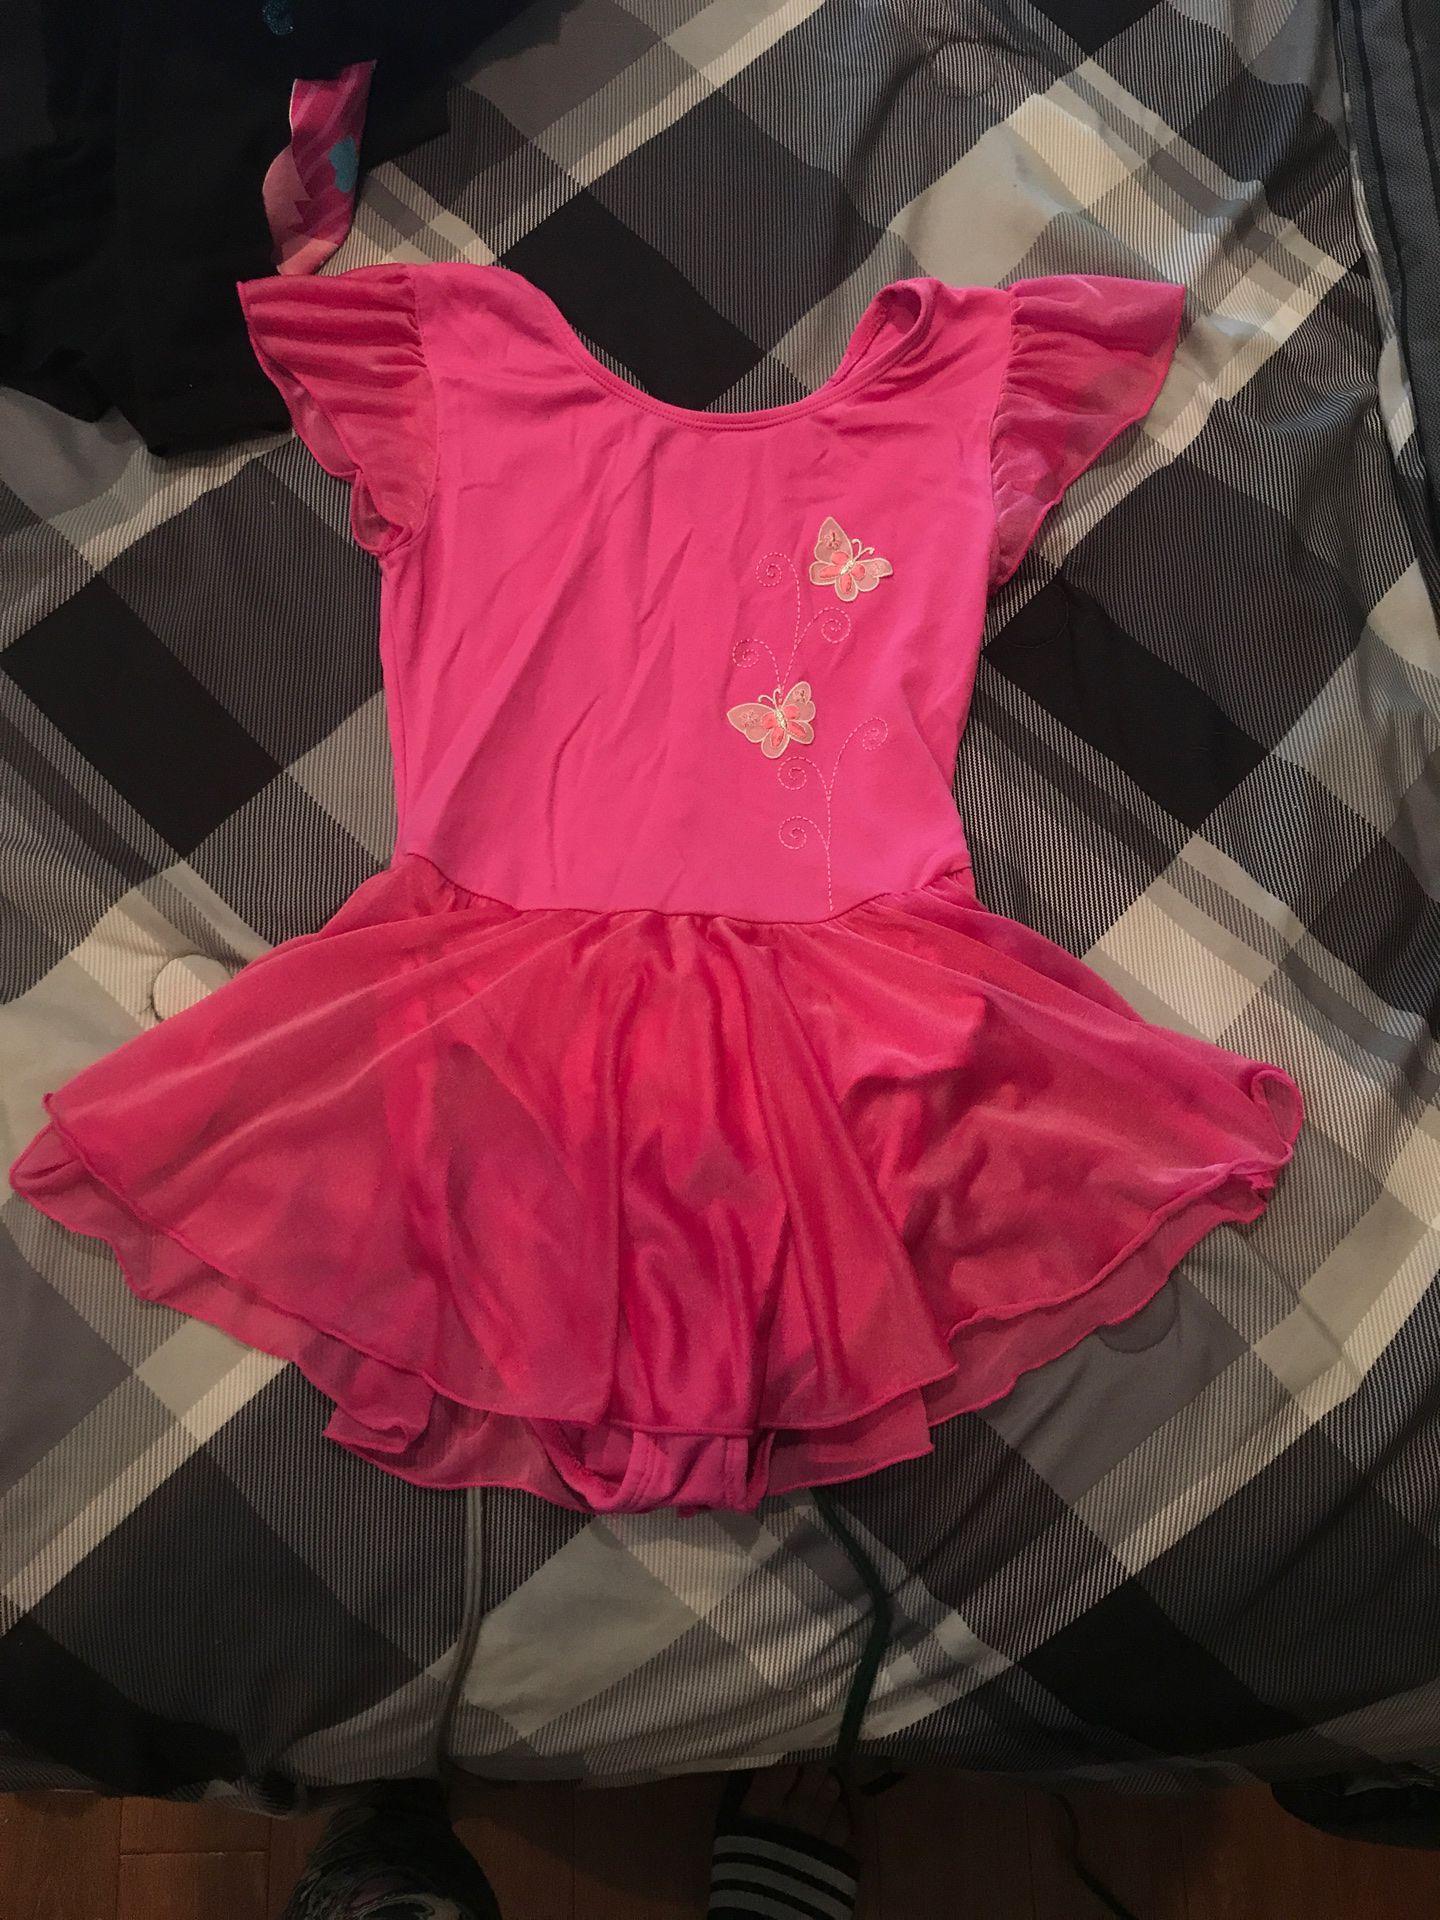 Ballet dress up outfit size 12 kids runs smaller worn once